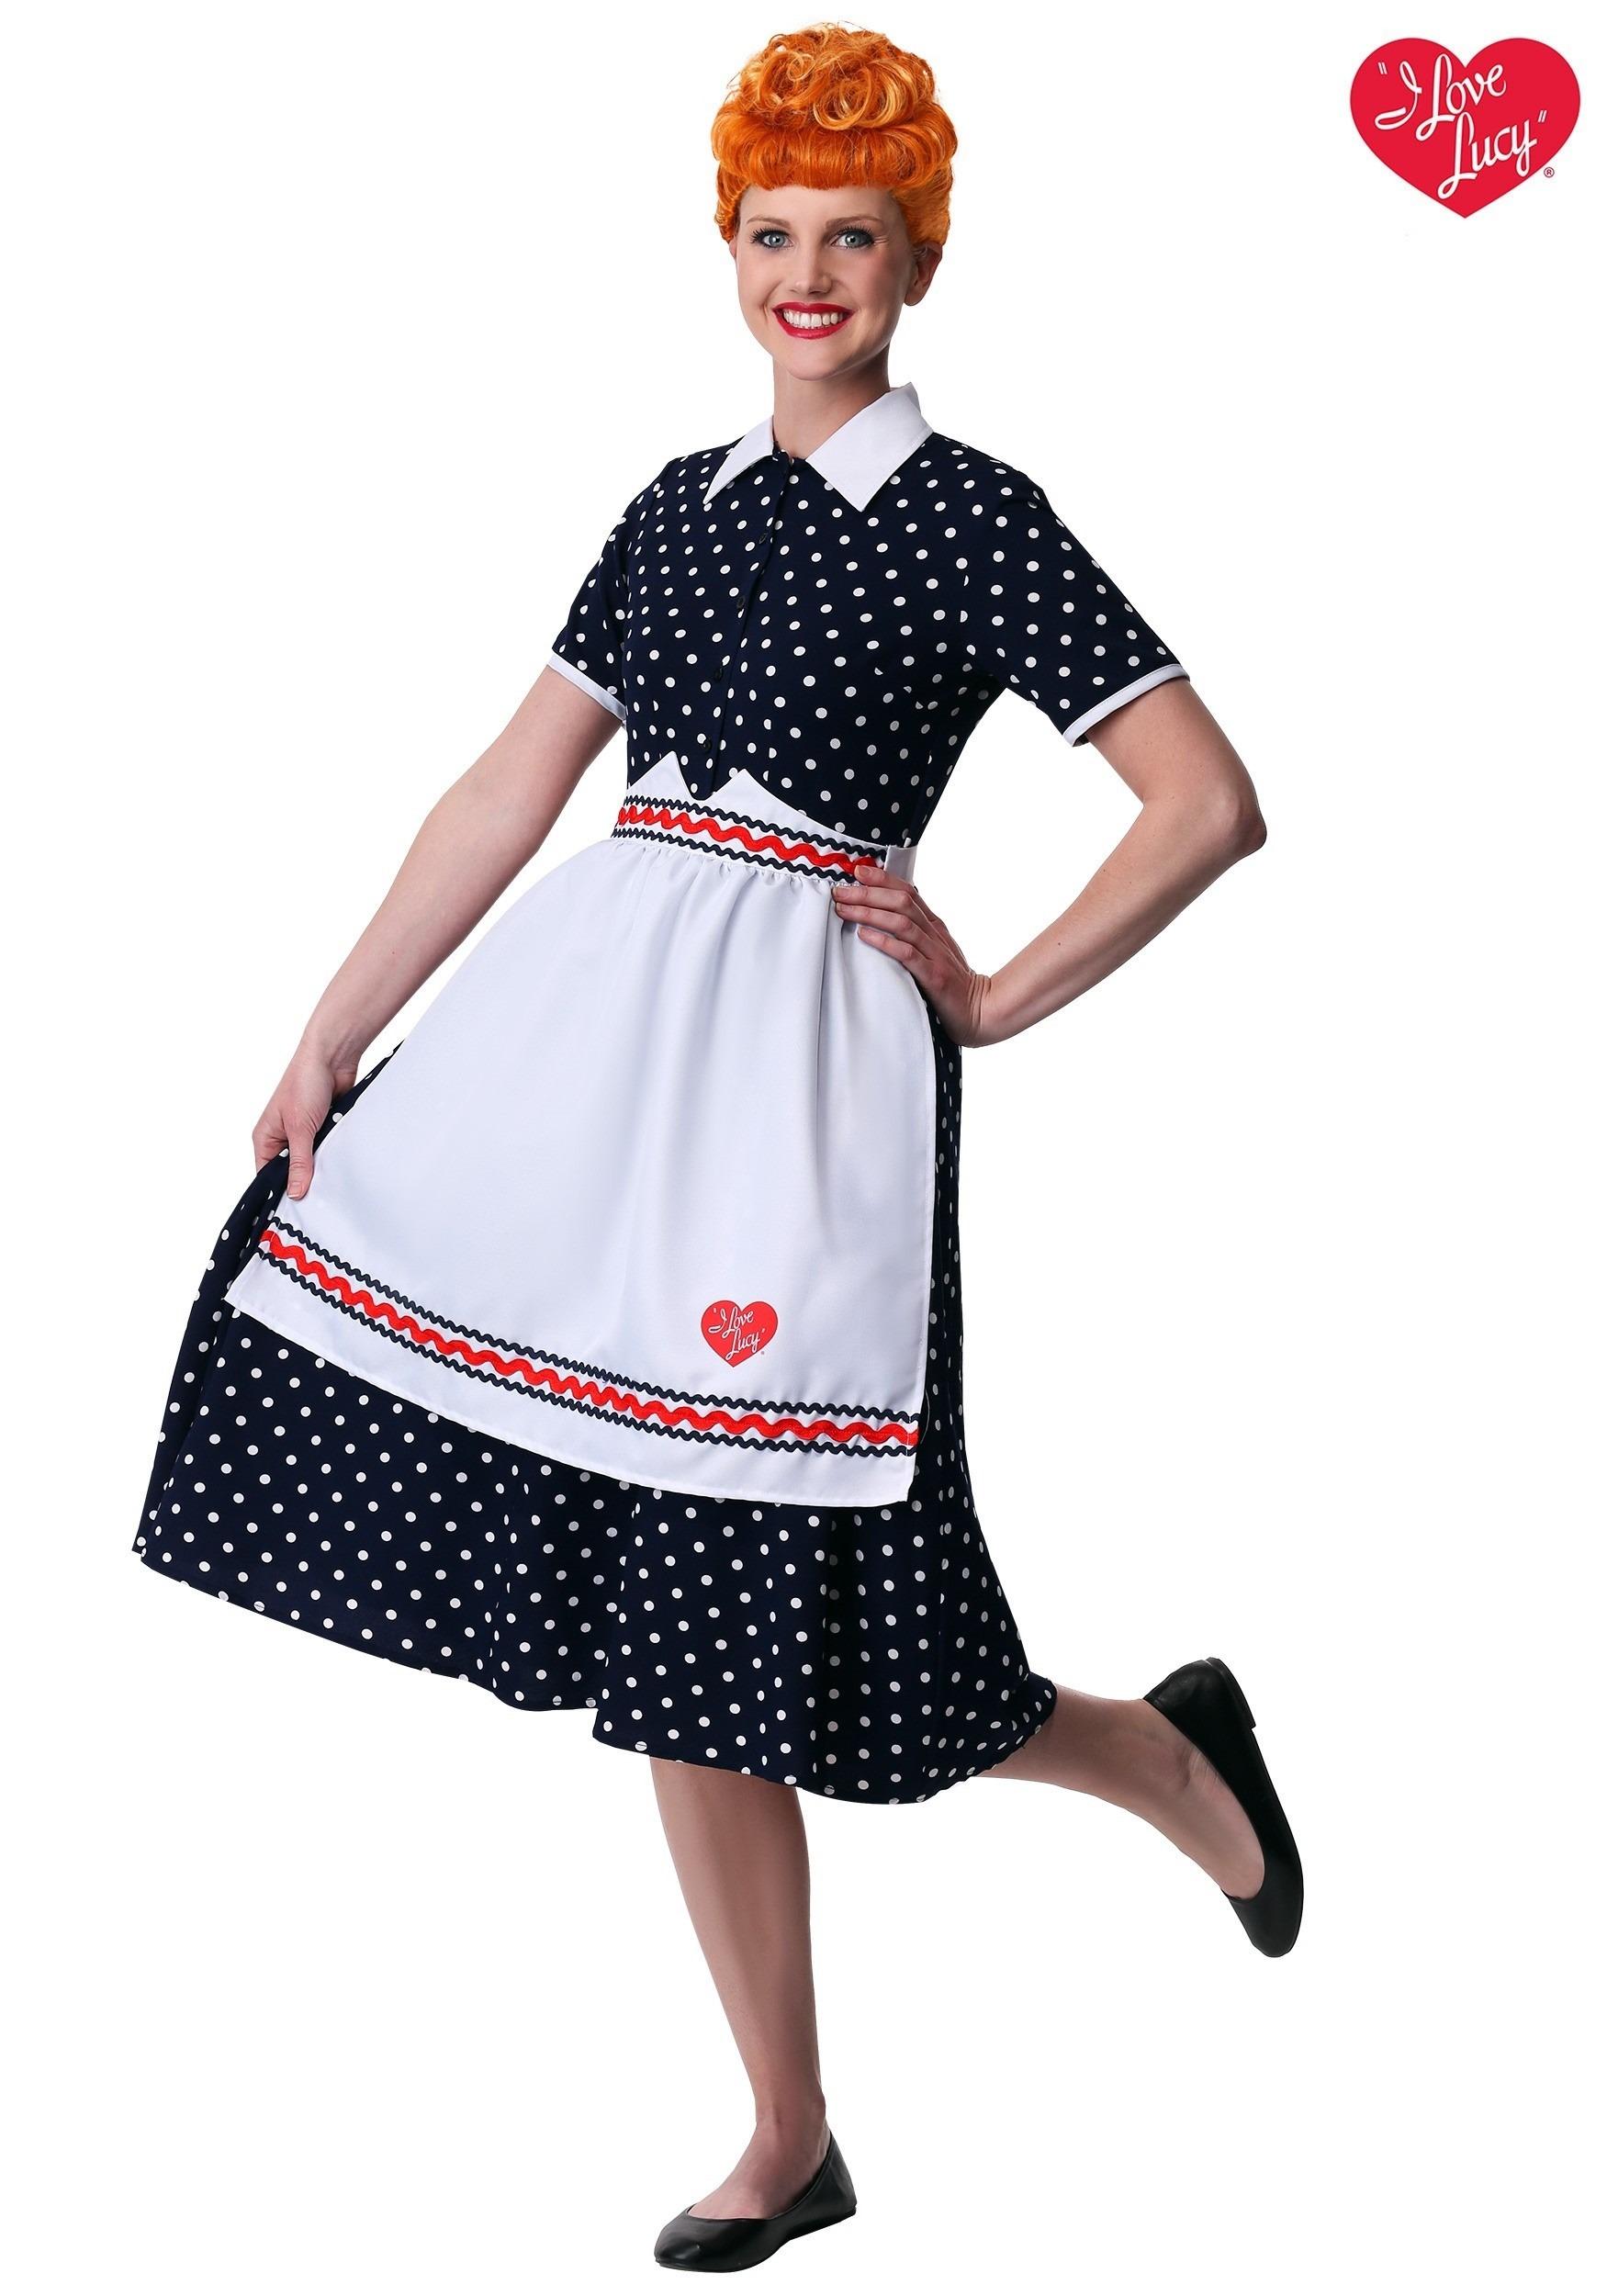 Plus Size I Love Lucy Women s Lucy Costume 1X 2X a285aeb7b9